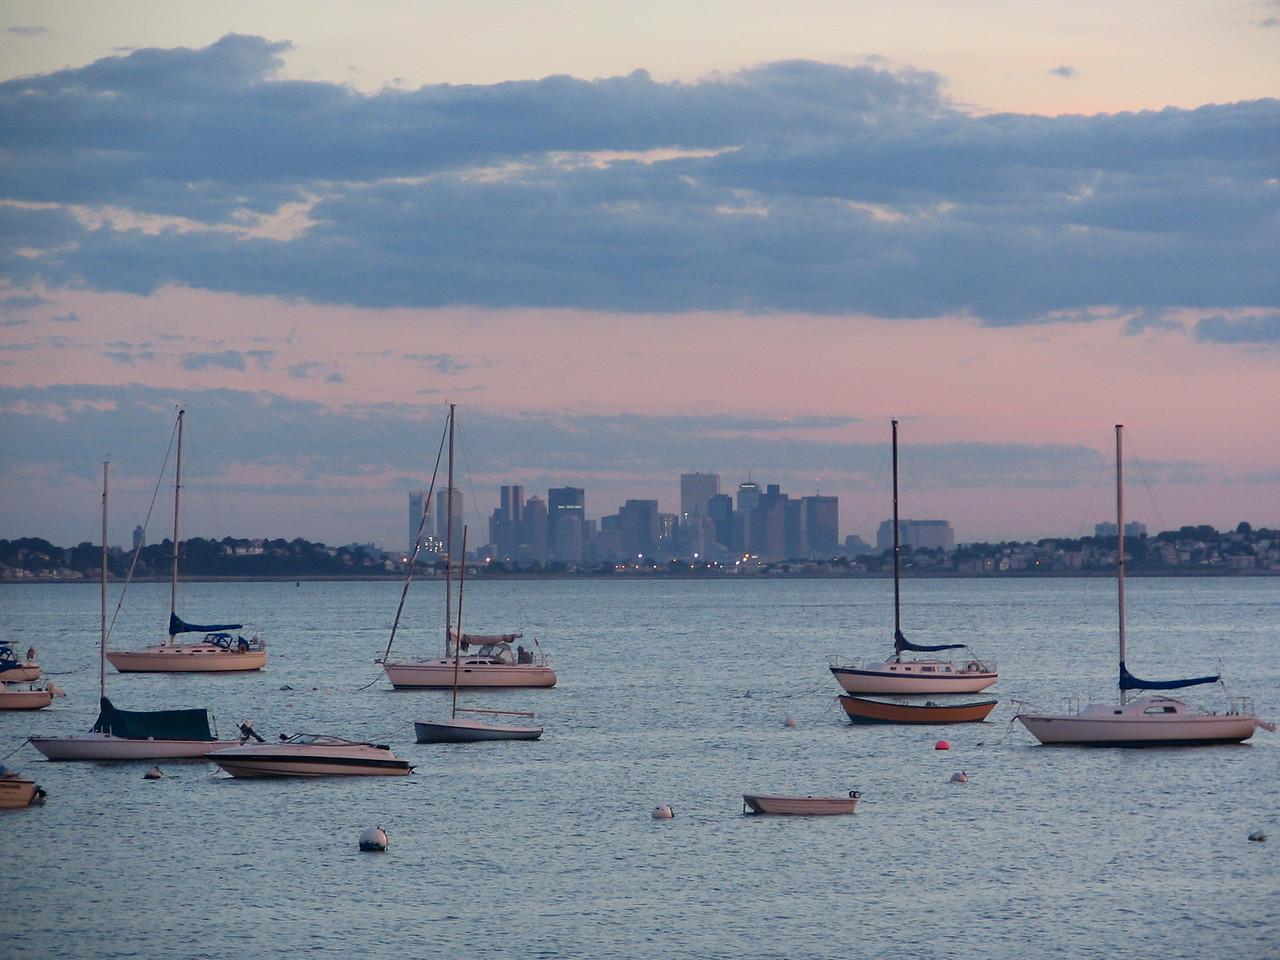 Boston skyline taken from Nahant marina